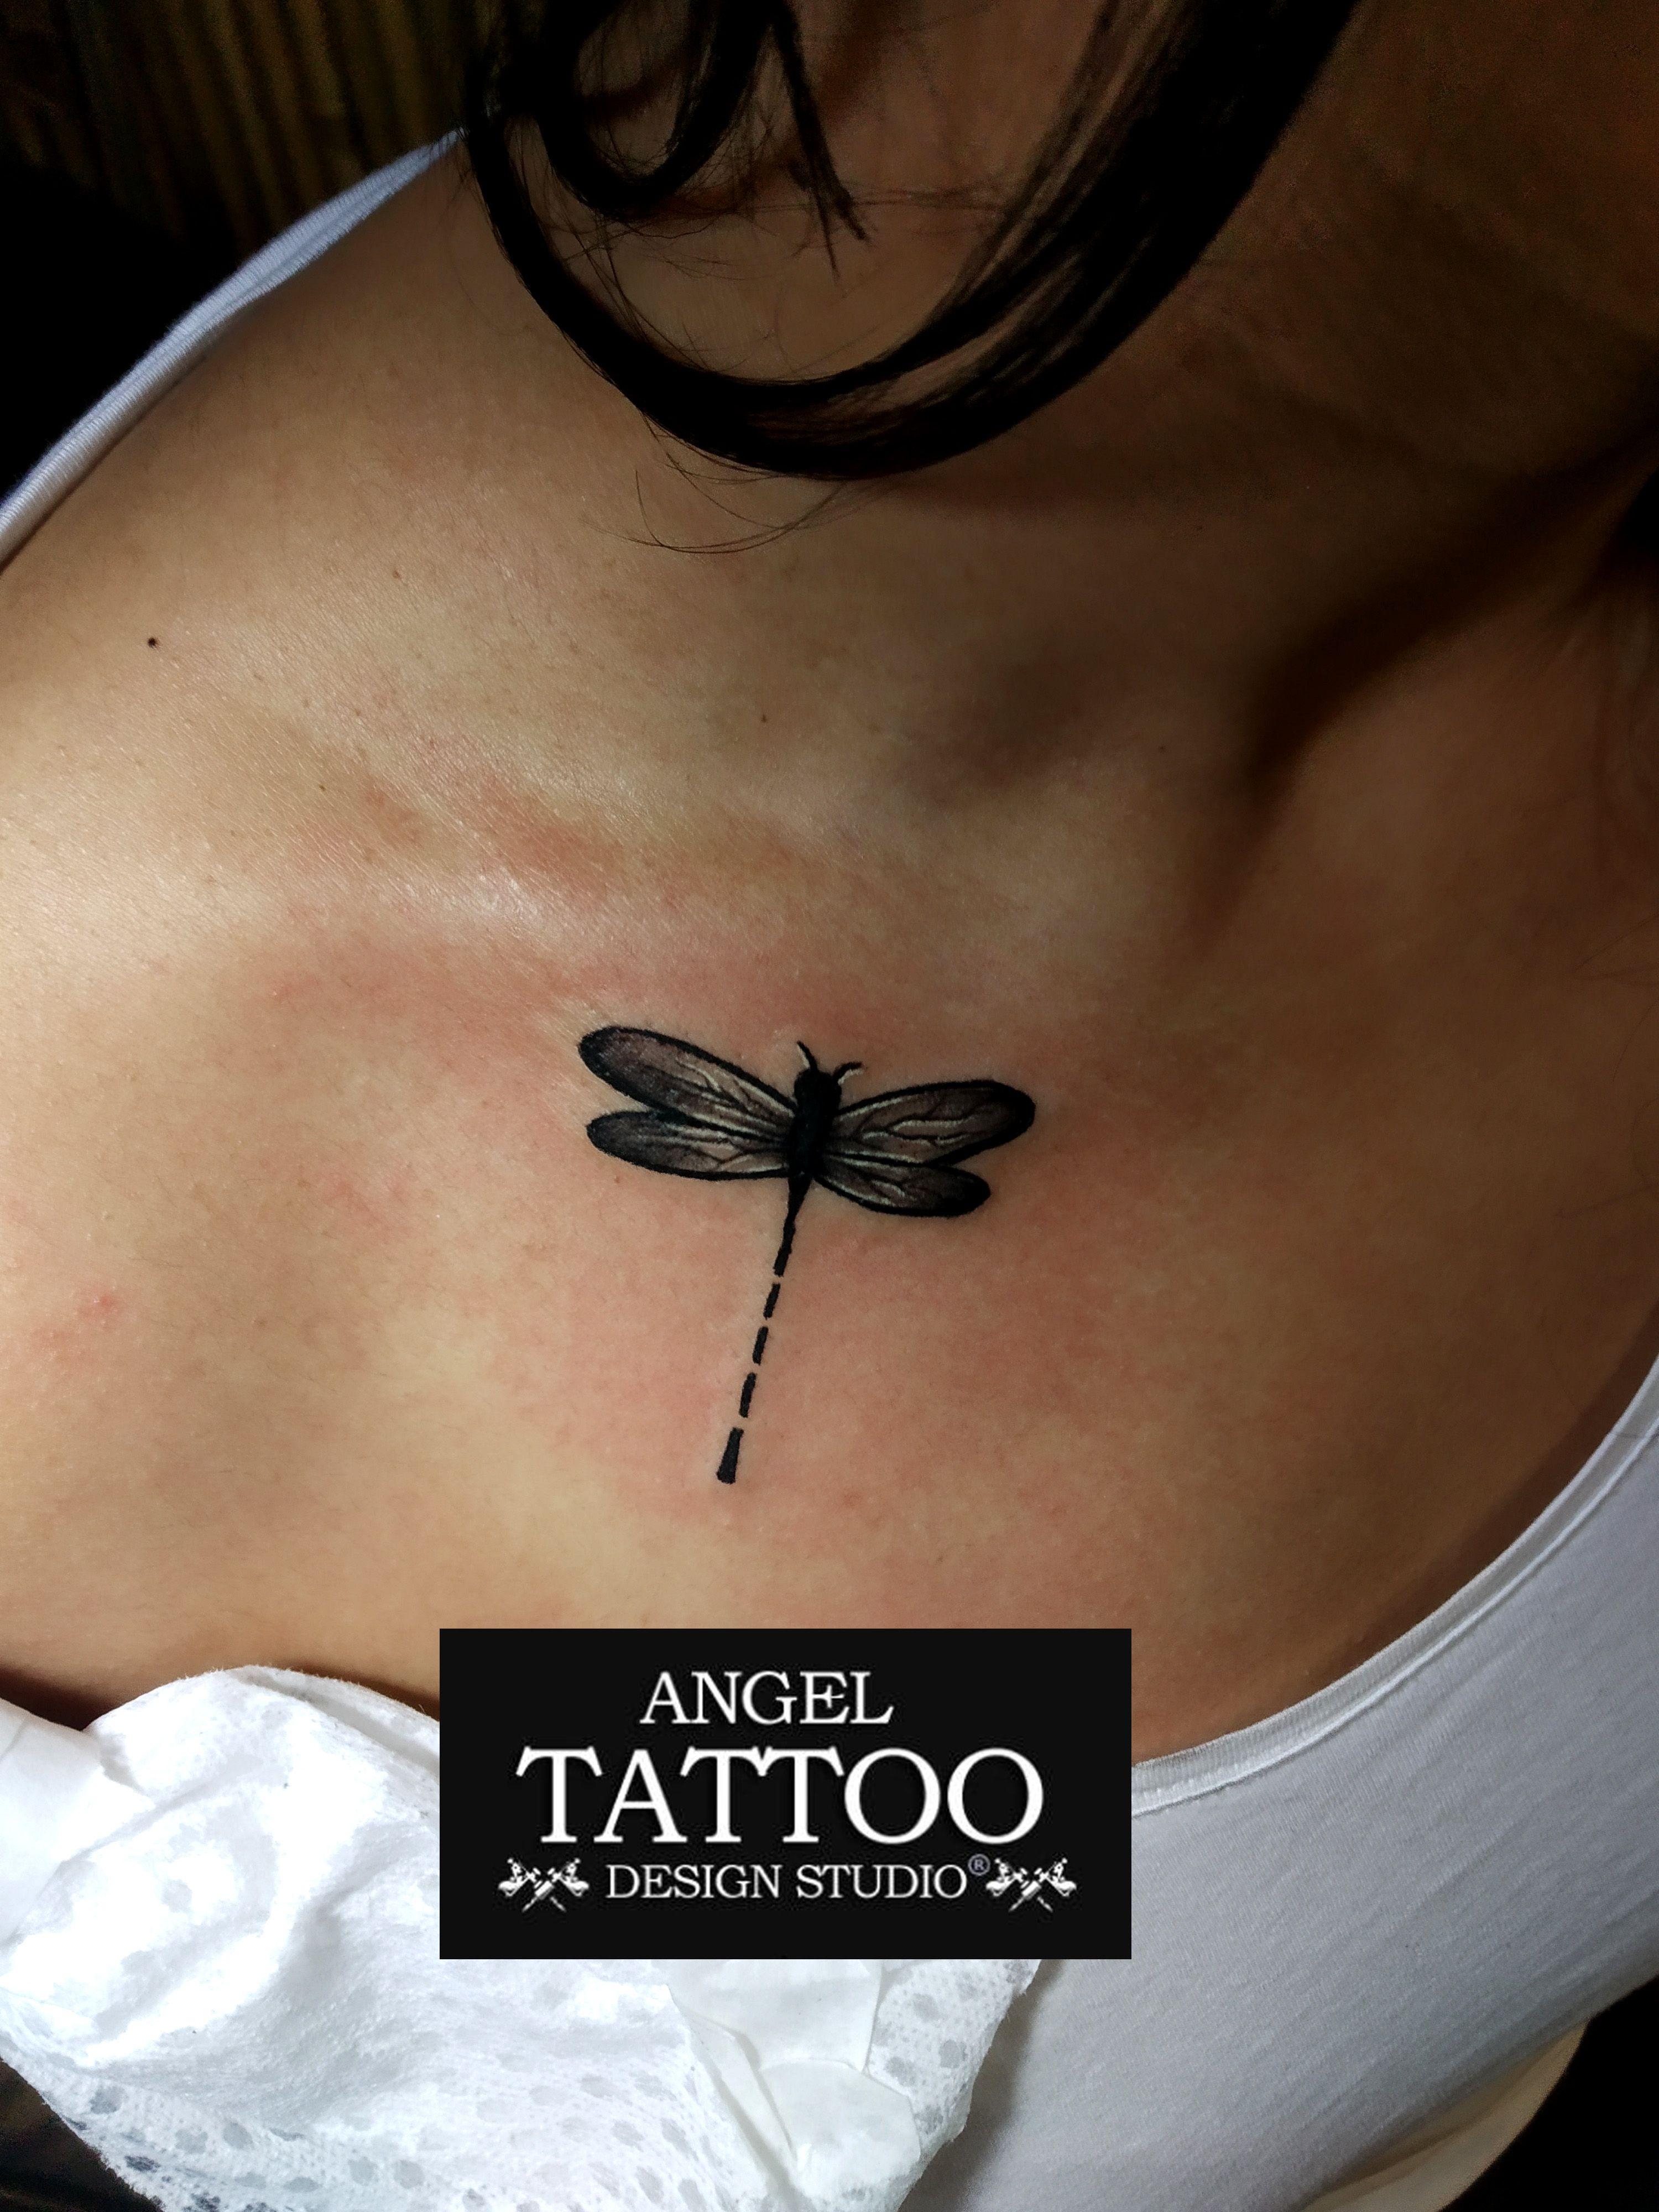 Dragonfly tattoo made at angel tattoo design studio